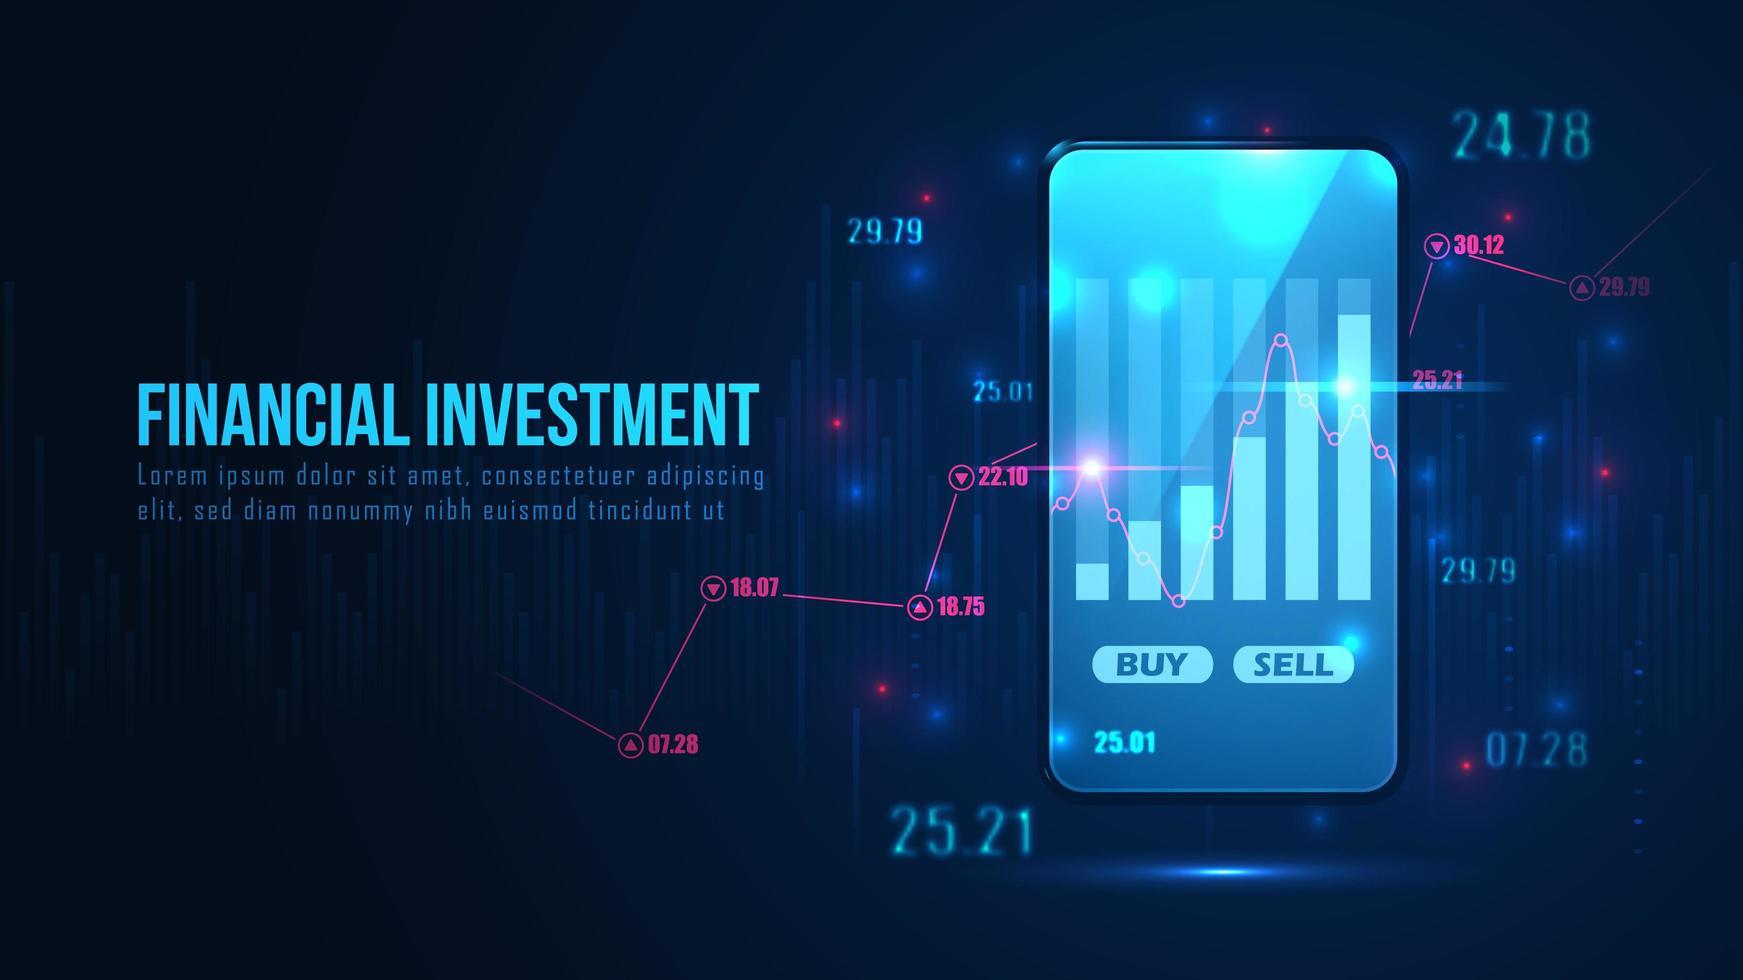 financieel investeringsontwerp met handelsgrafiek op telefoon vector